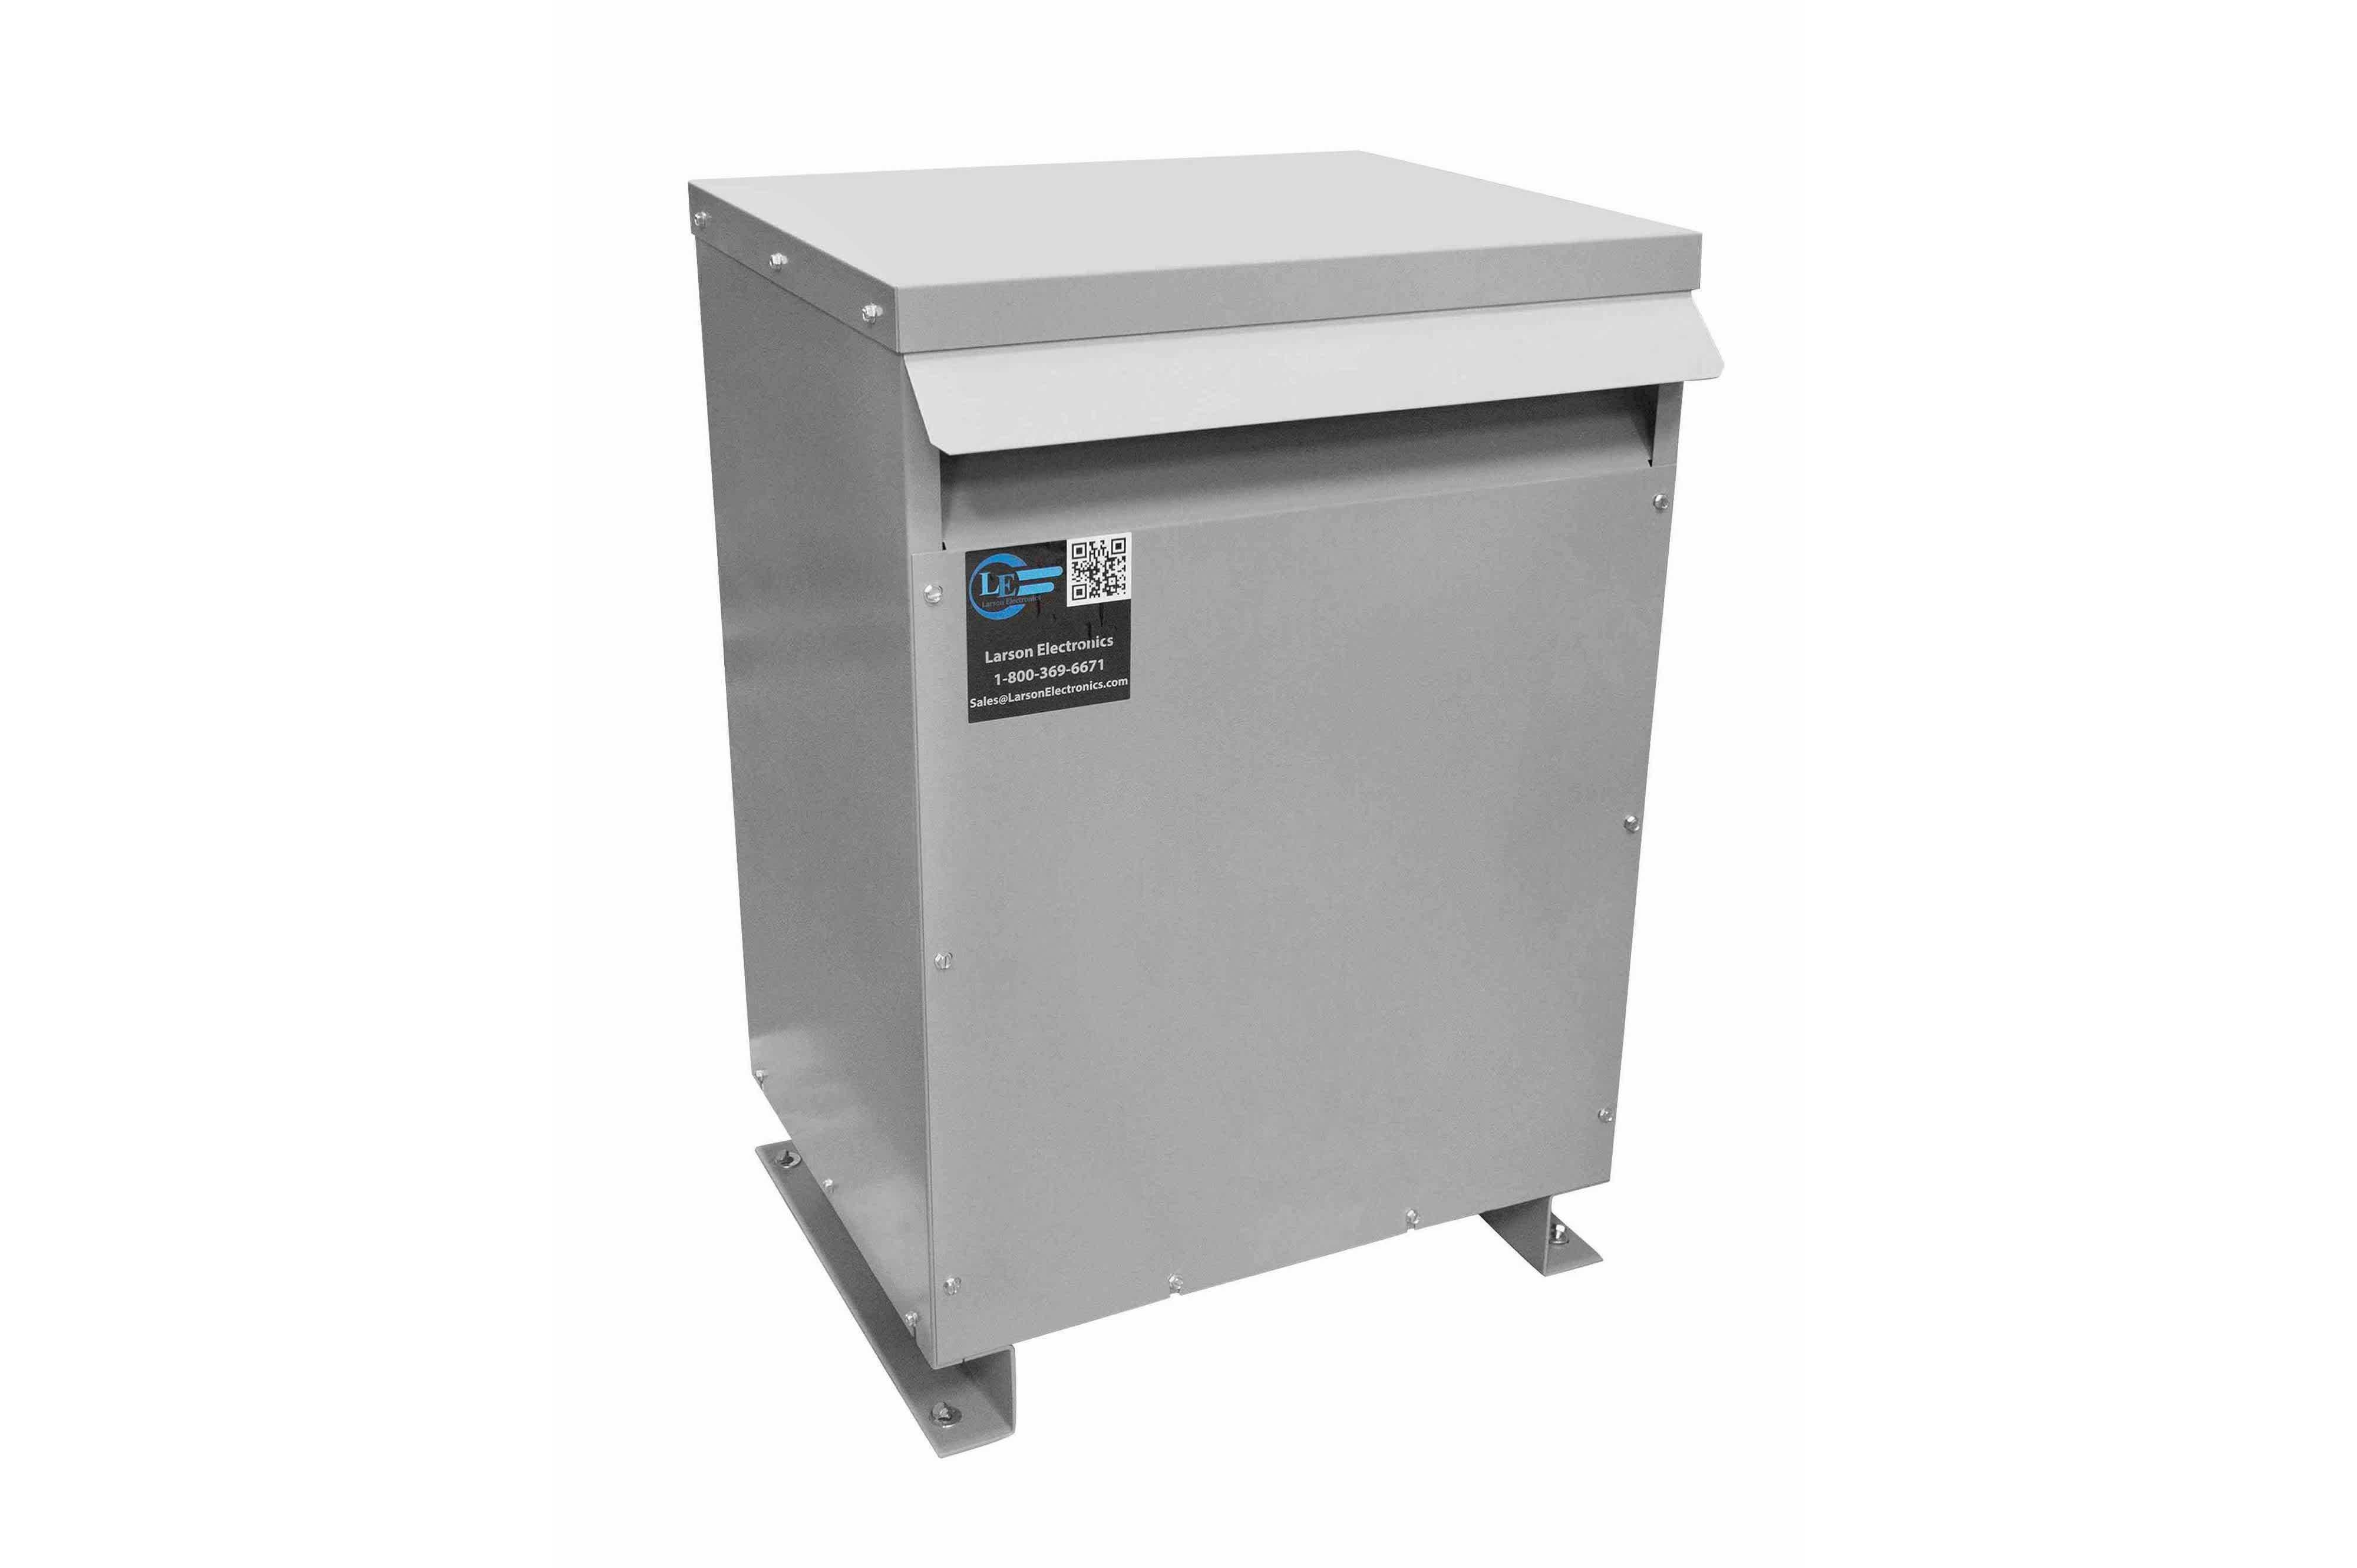 600 kVA 3PH Isolation Transformer, 415V Wye Primary, 208V Delta Secondary, N3R, Ventilated, 60 Hz